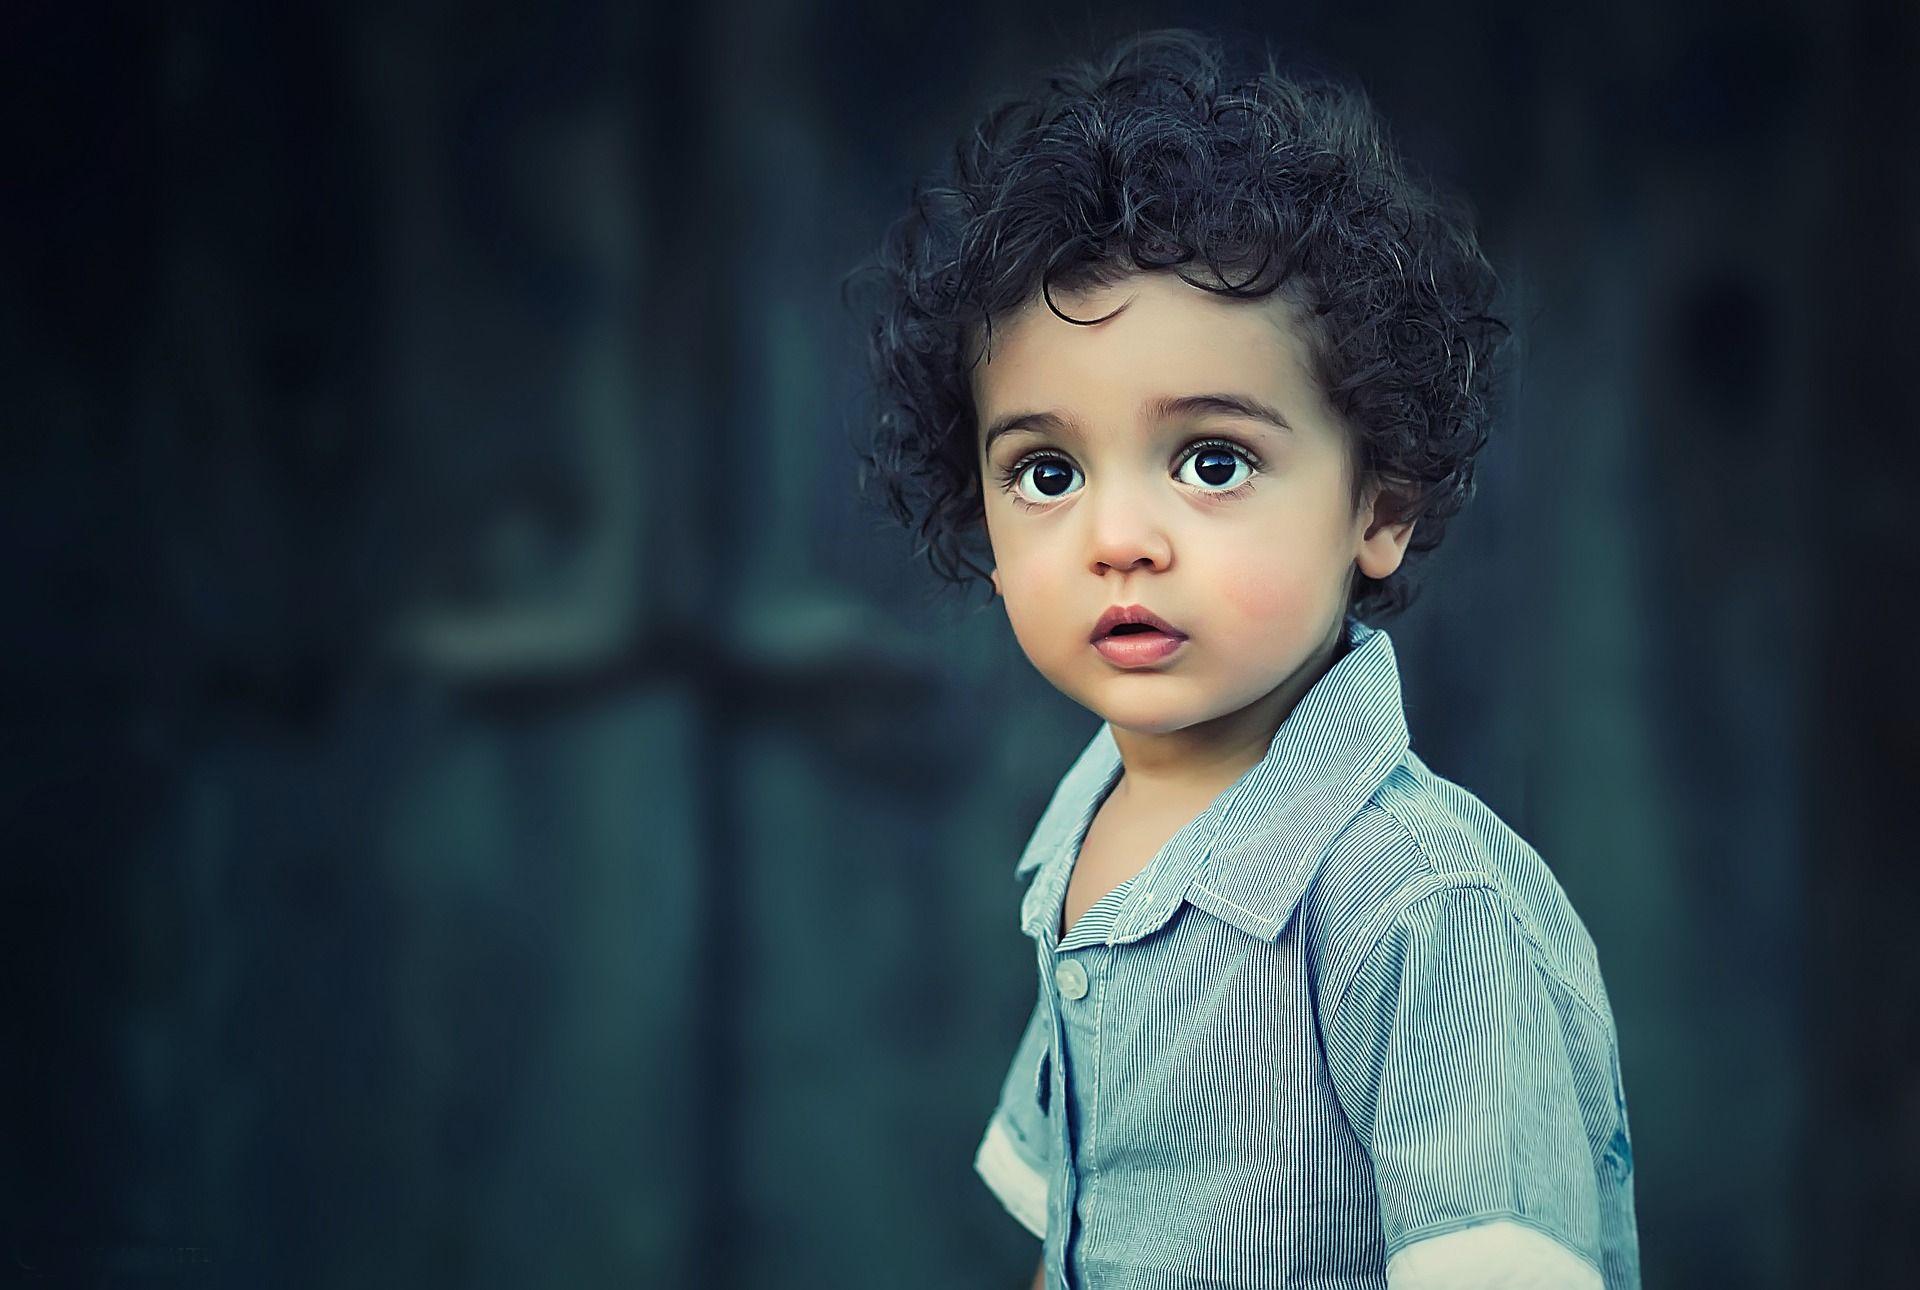 Beautiful Baby Photo Retouching And Editing